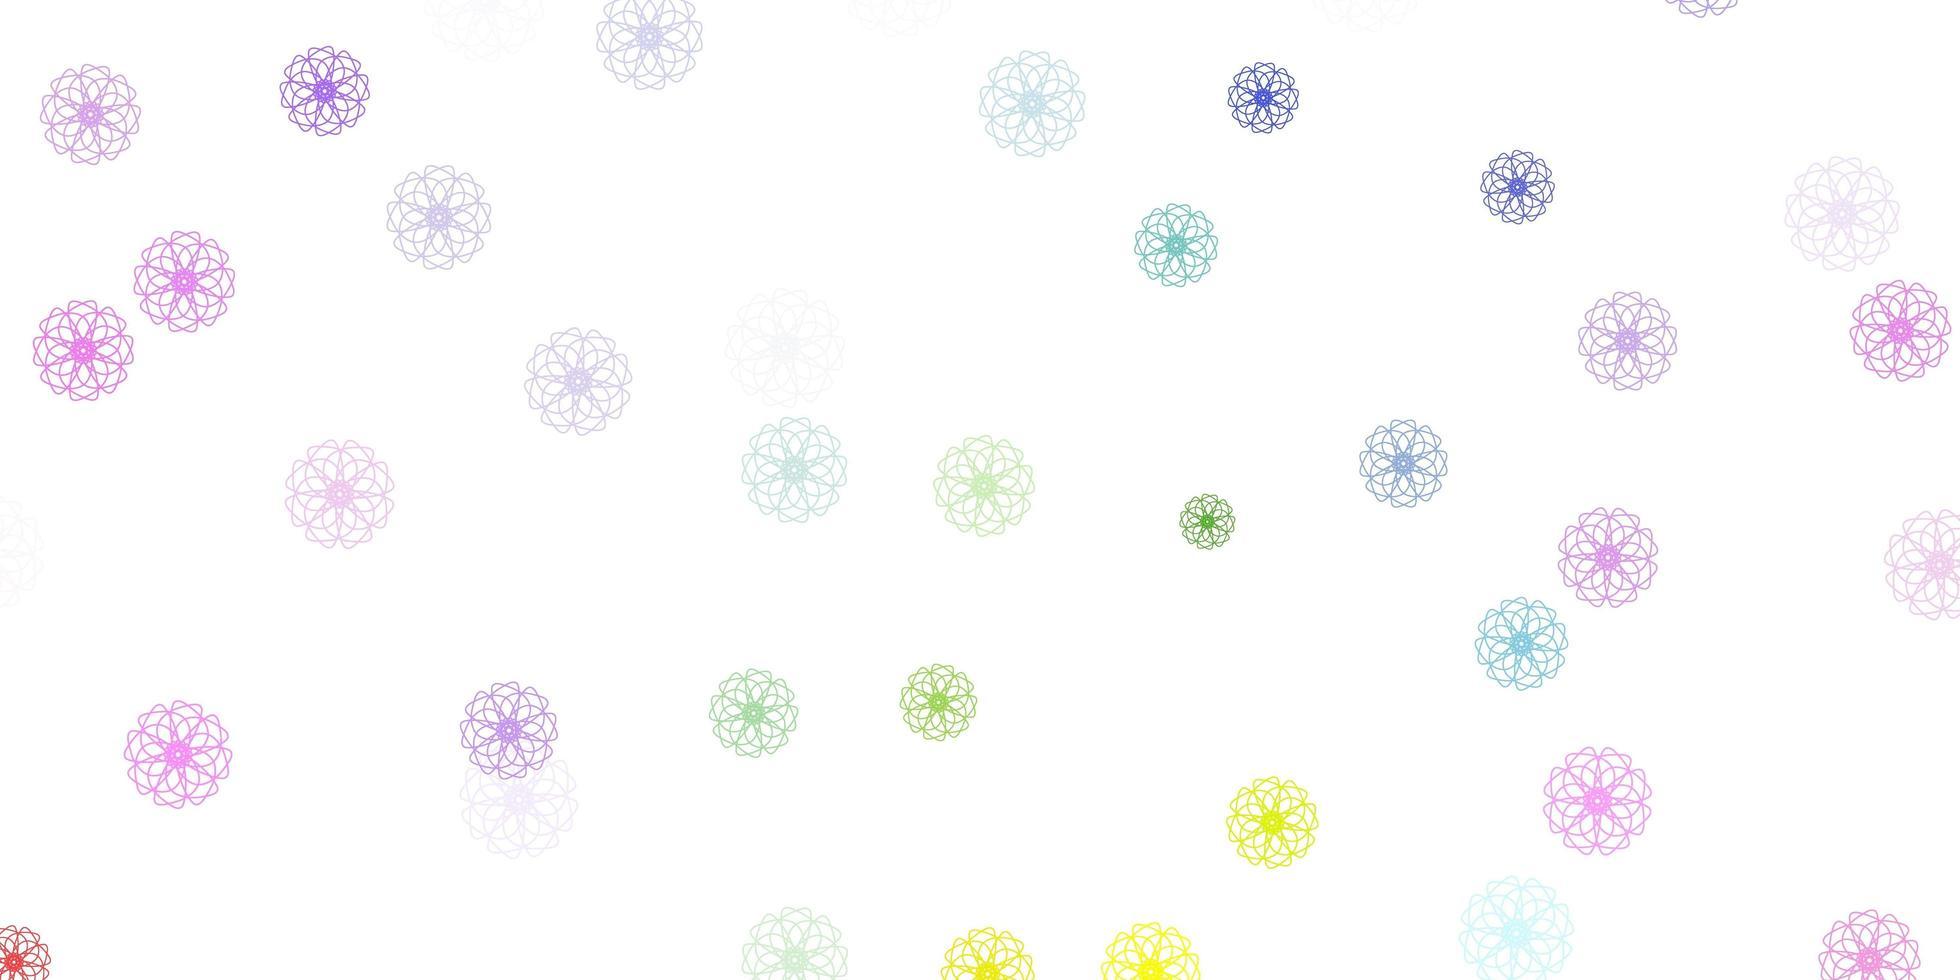 modelo de doodle de vetor multicolor luz com flores.